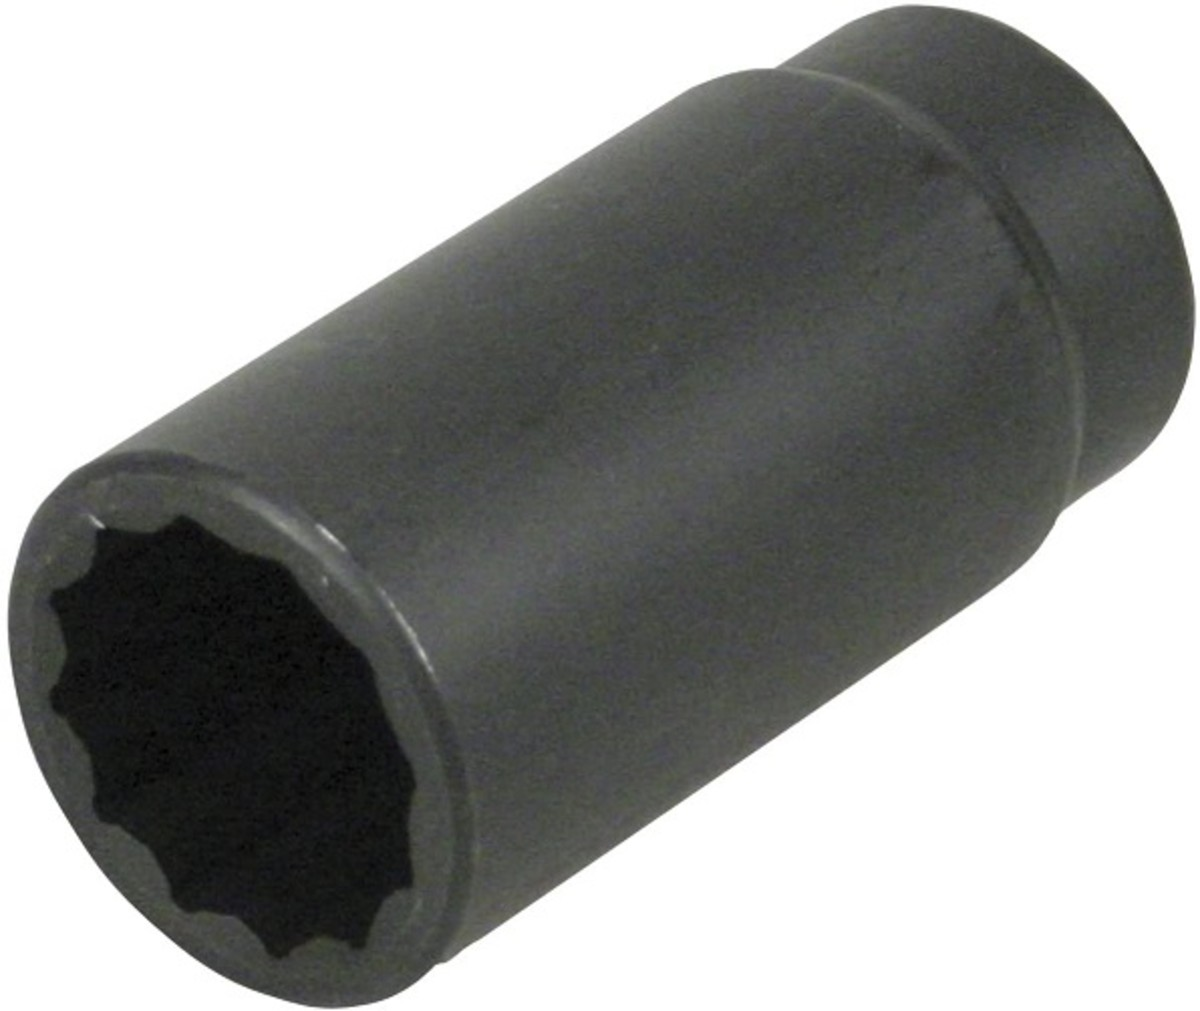 30-mm 12-point deep impact socket